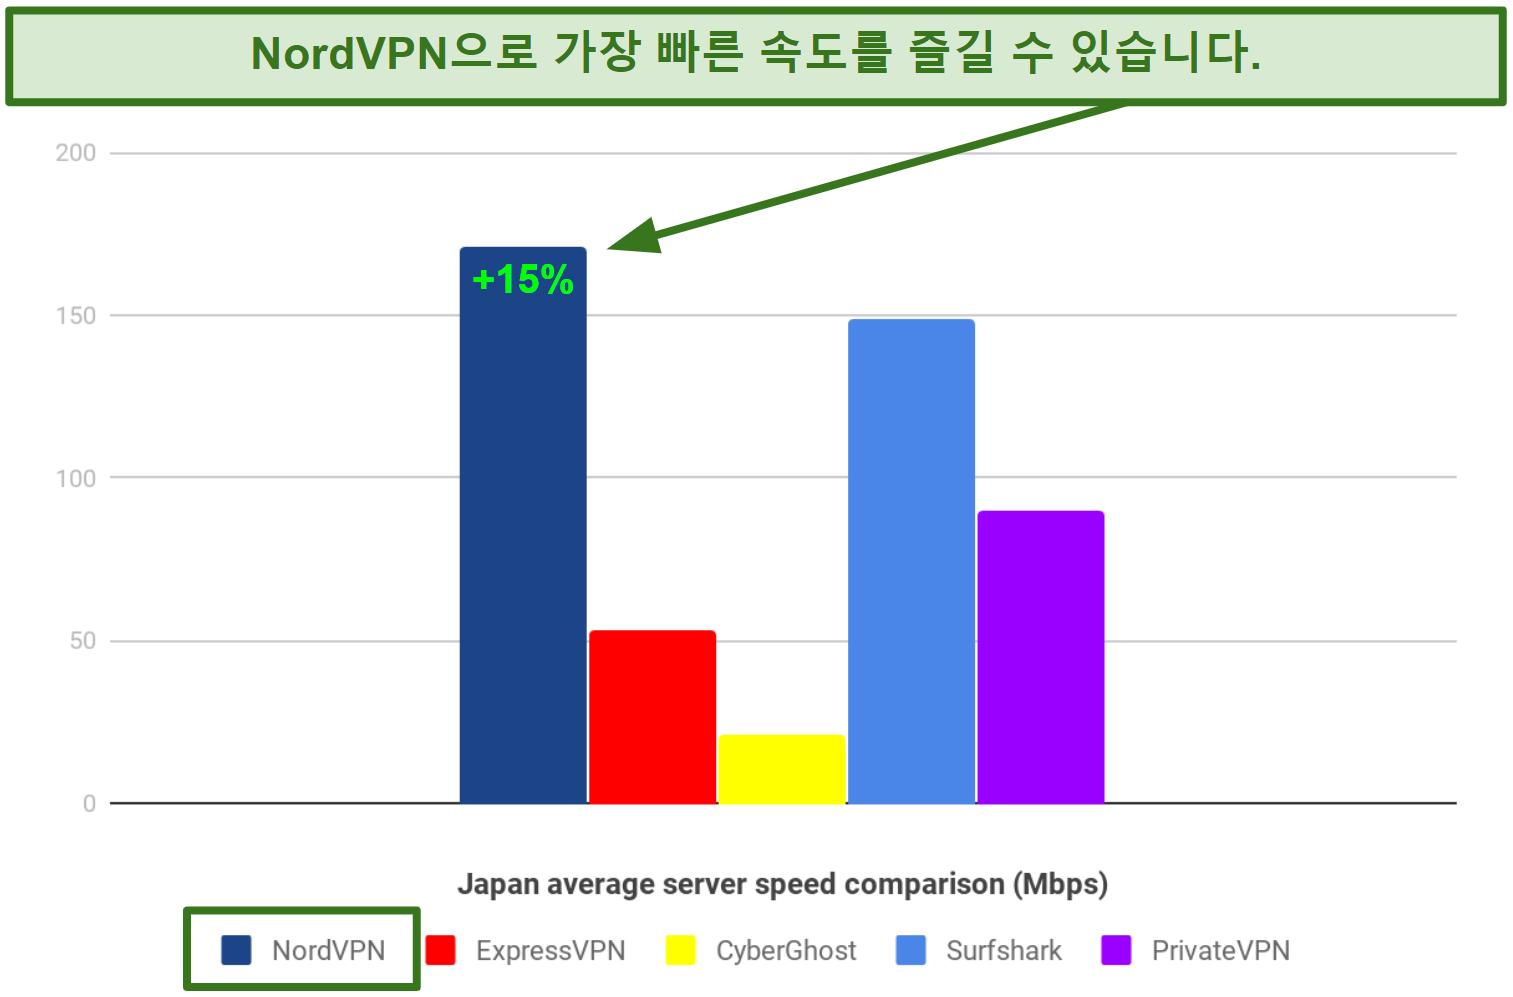 NordVPN, ExpressVPN, CyberGhost, Surfshark 및 PrivateVPN 간의 속도 차이를 보여주는 막대 차트 (NordVPN이 가장 빠름)